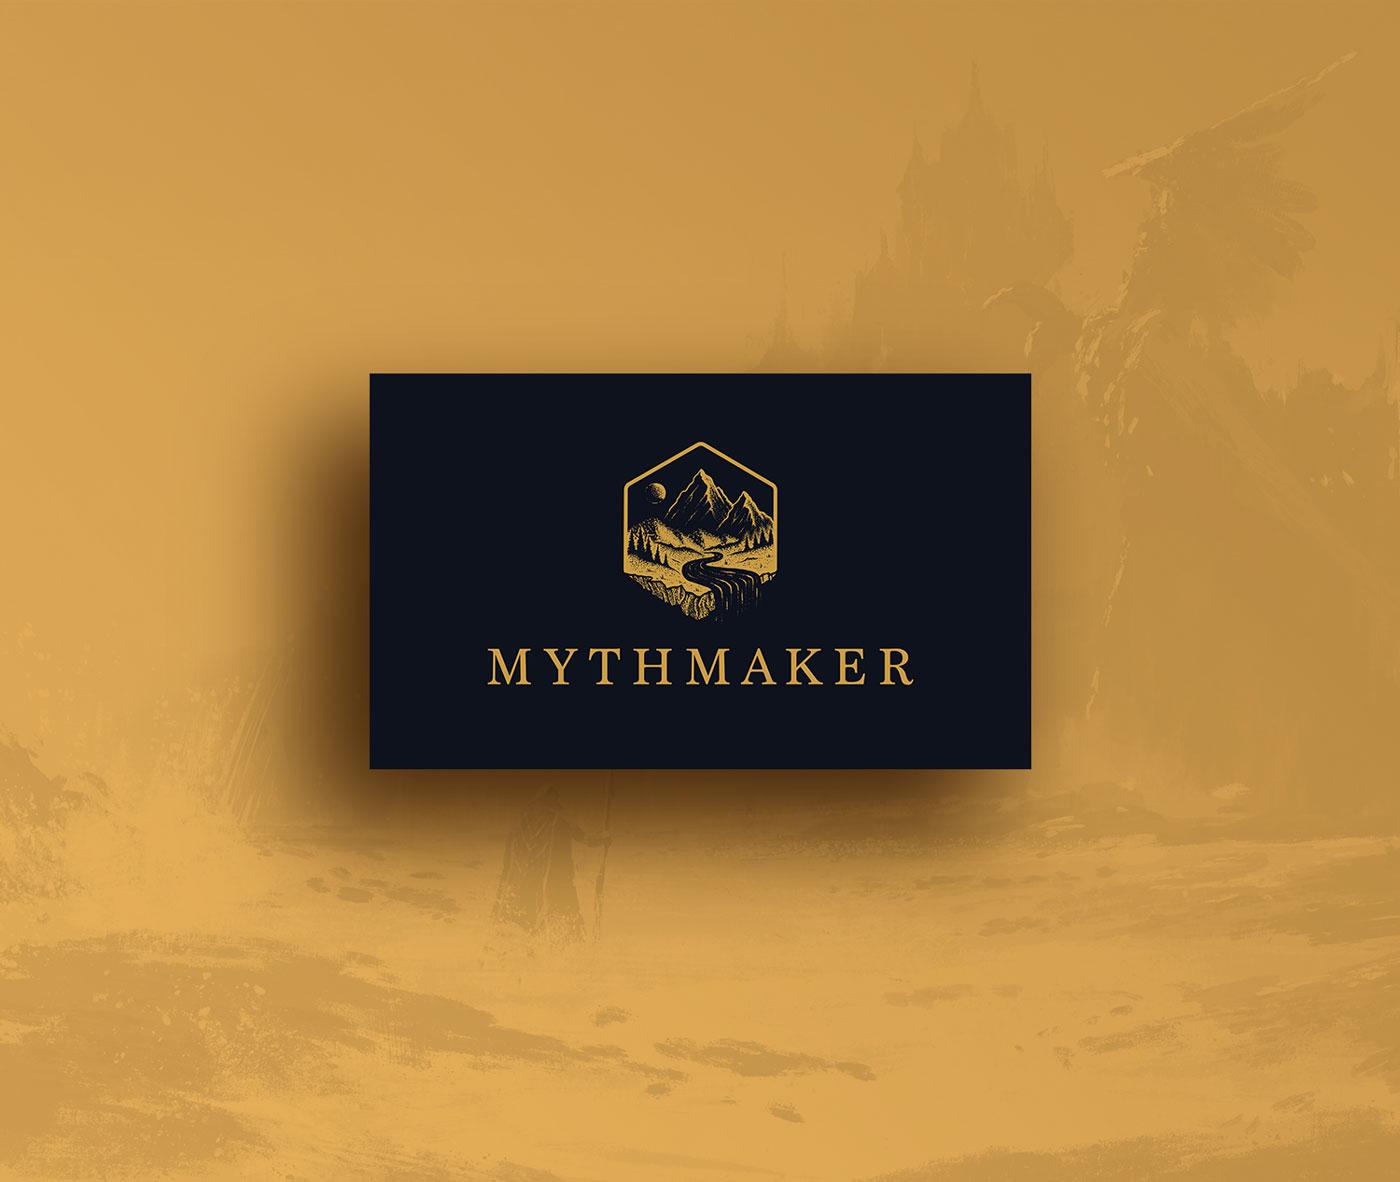 Mythmaker light logo design